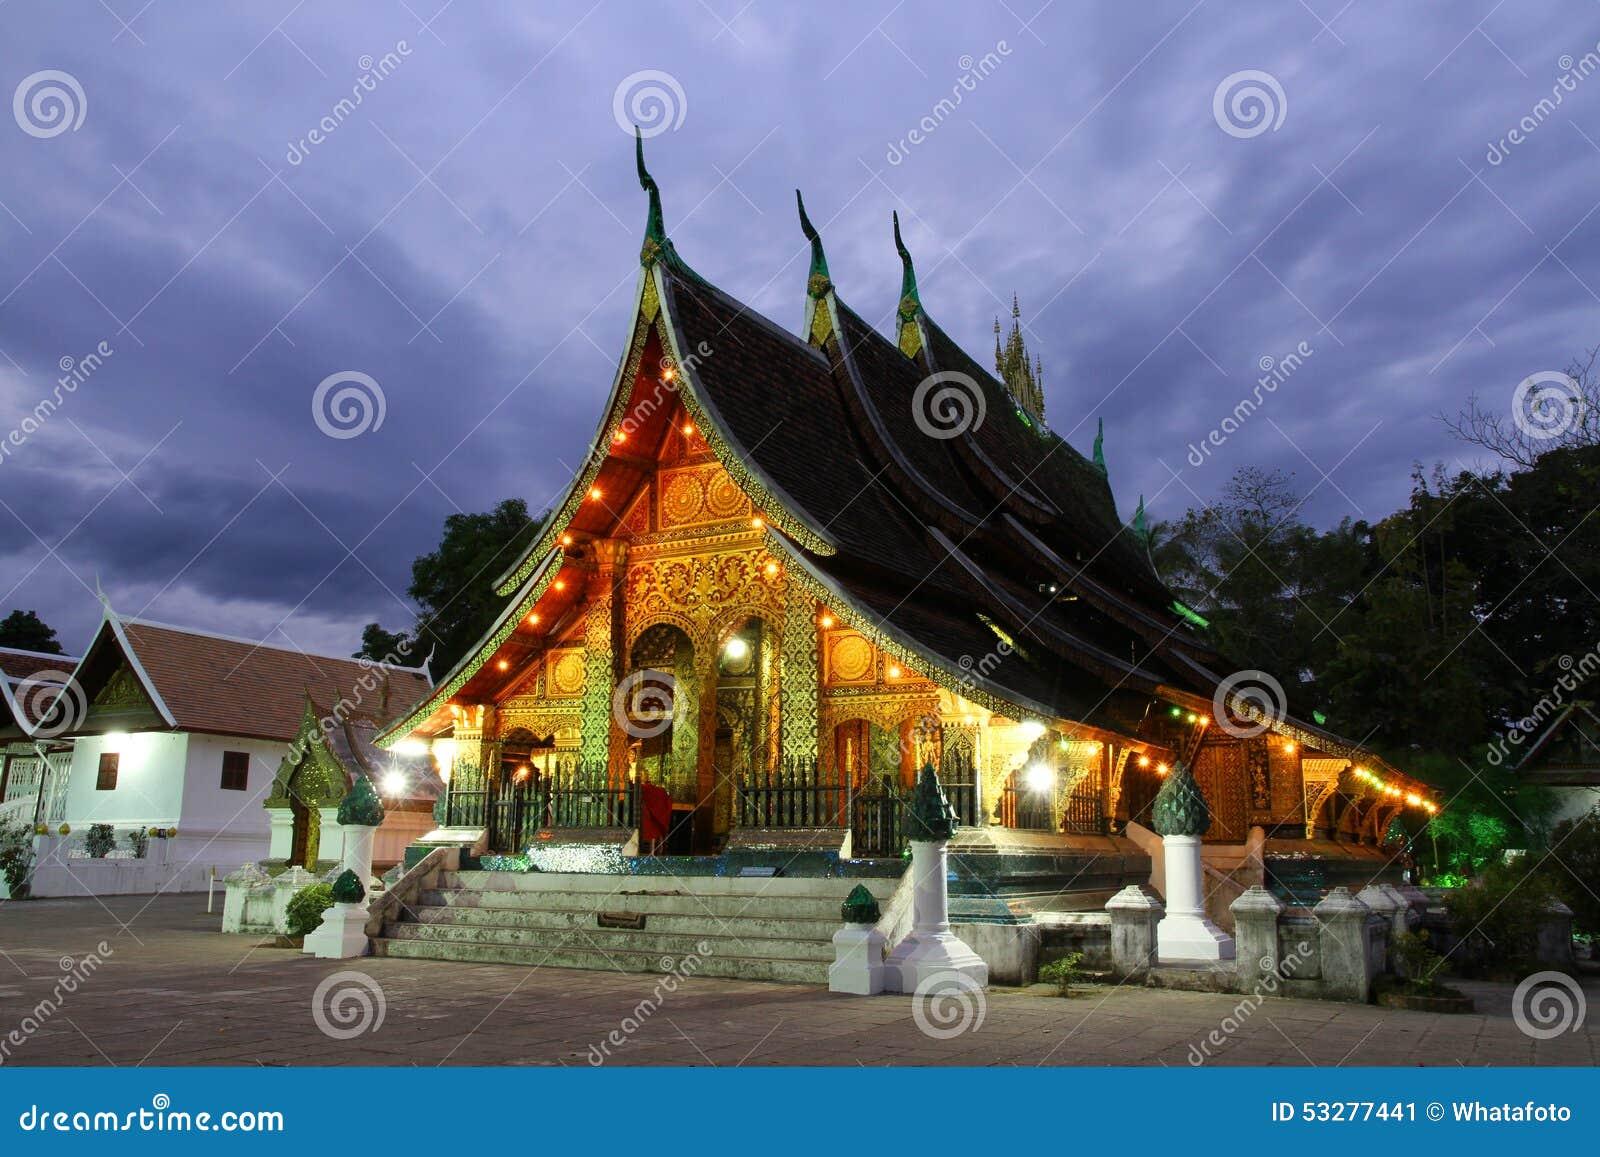 Colorful Wat Xieng thong temple at dusk in Luang Prabang, Loas